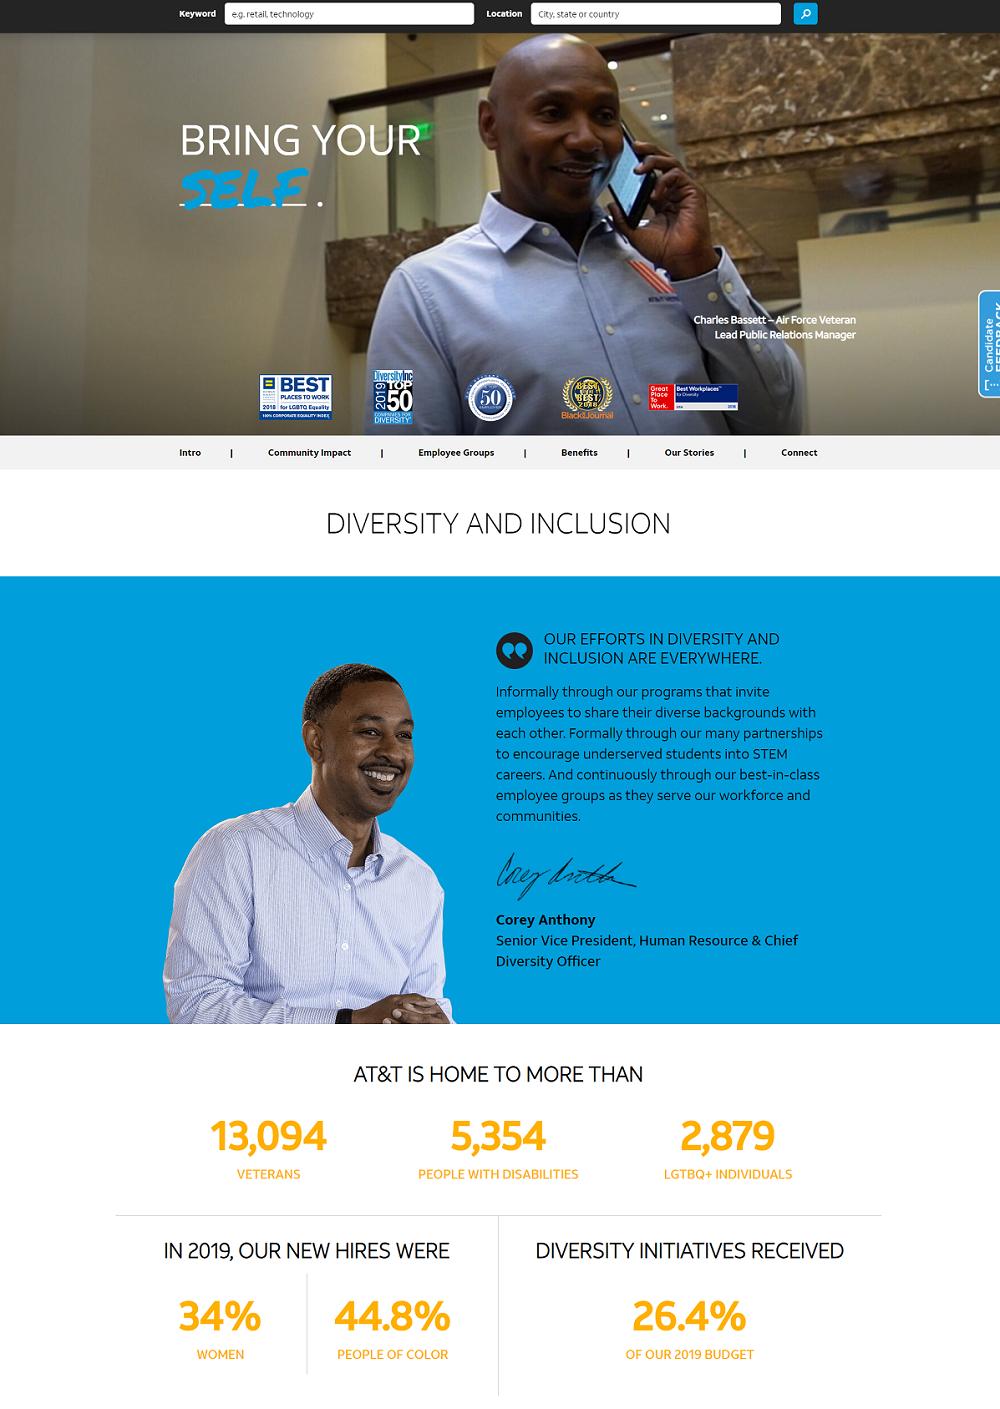 att diversity page